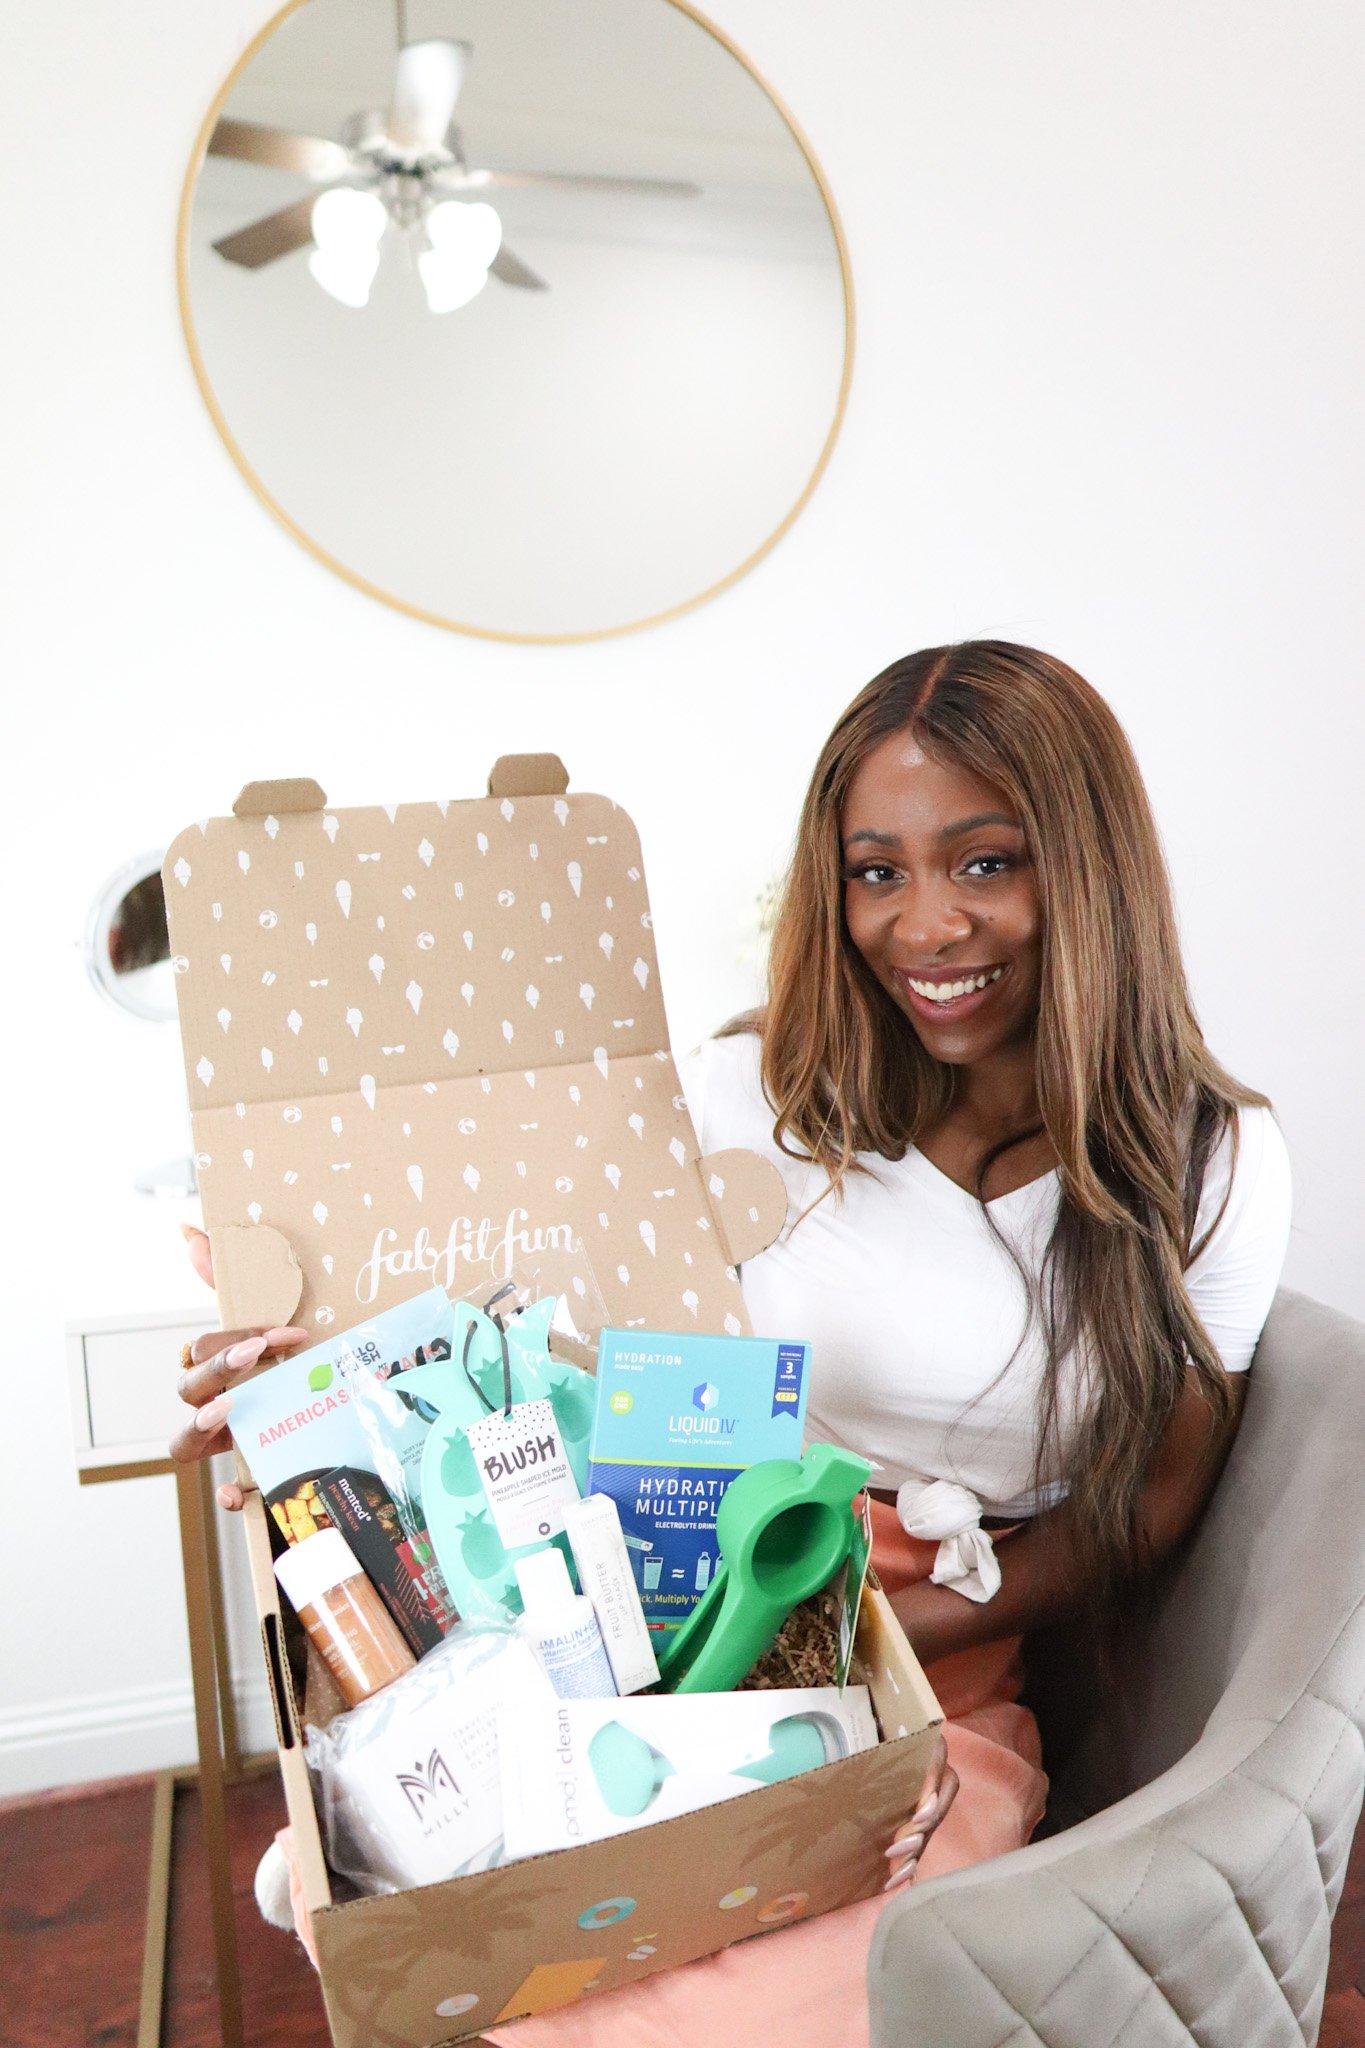 Subscription Beauty Box Review: FabFitFun